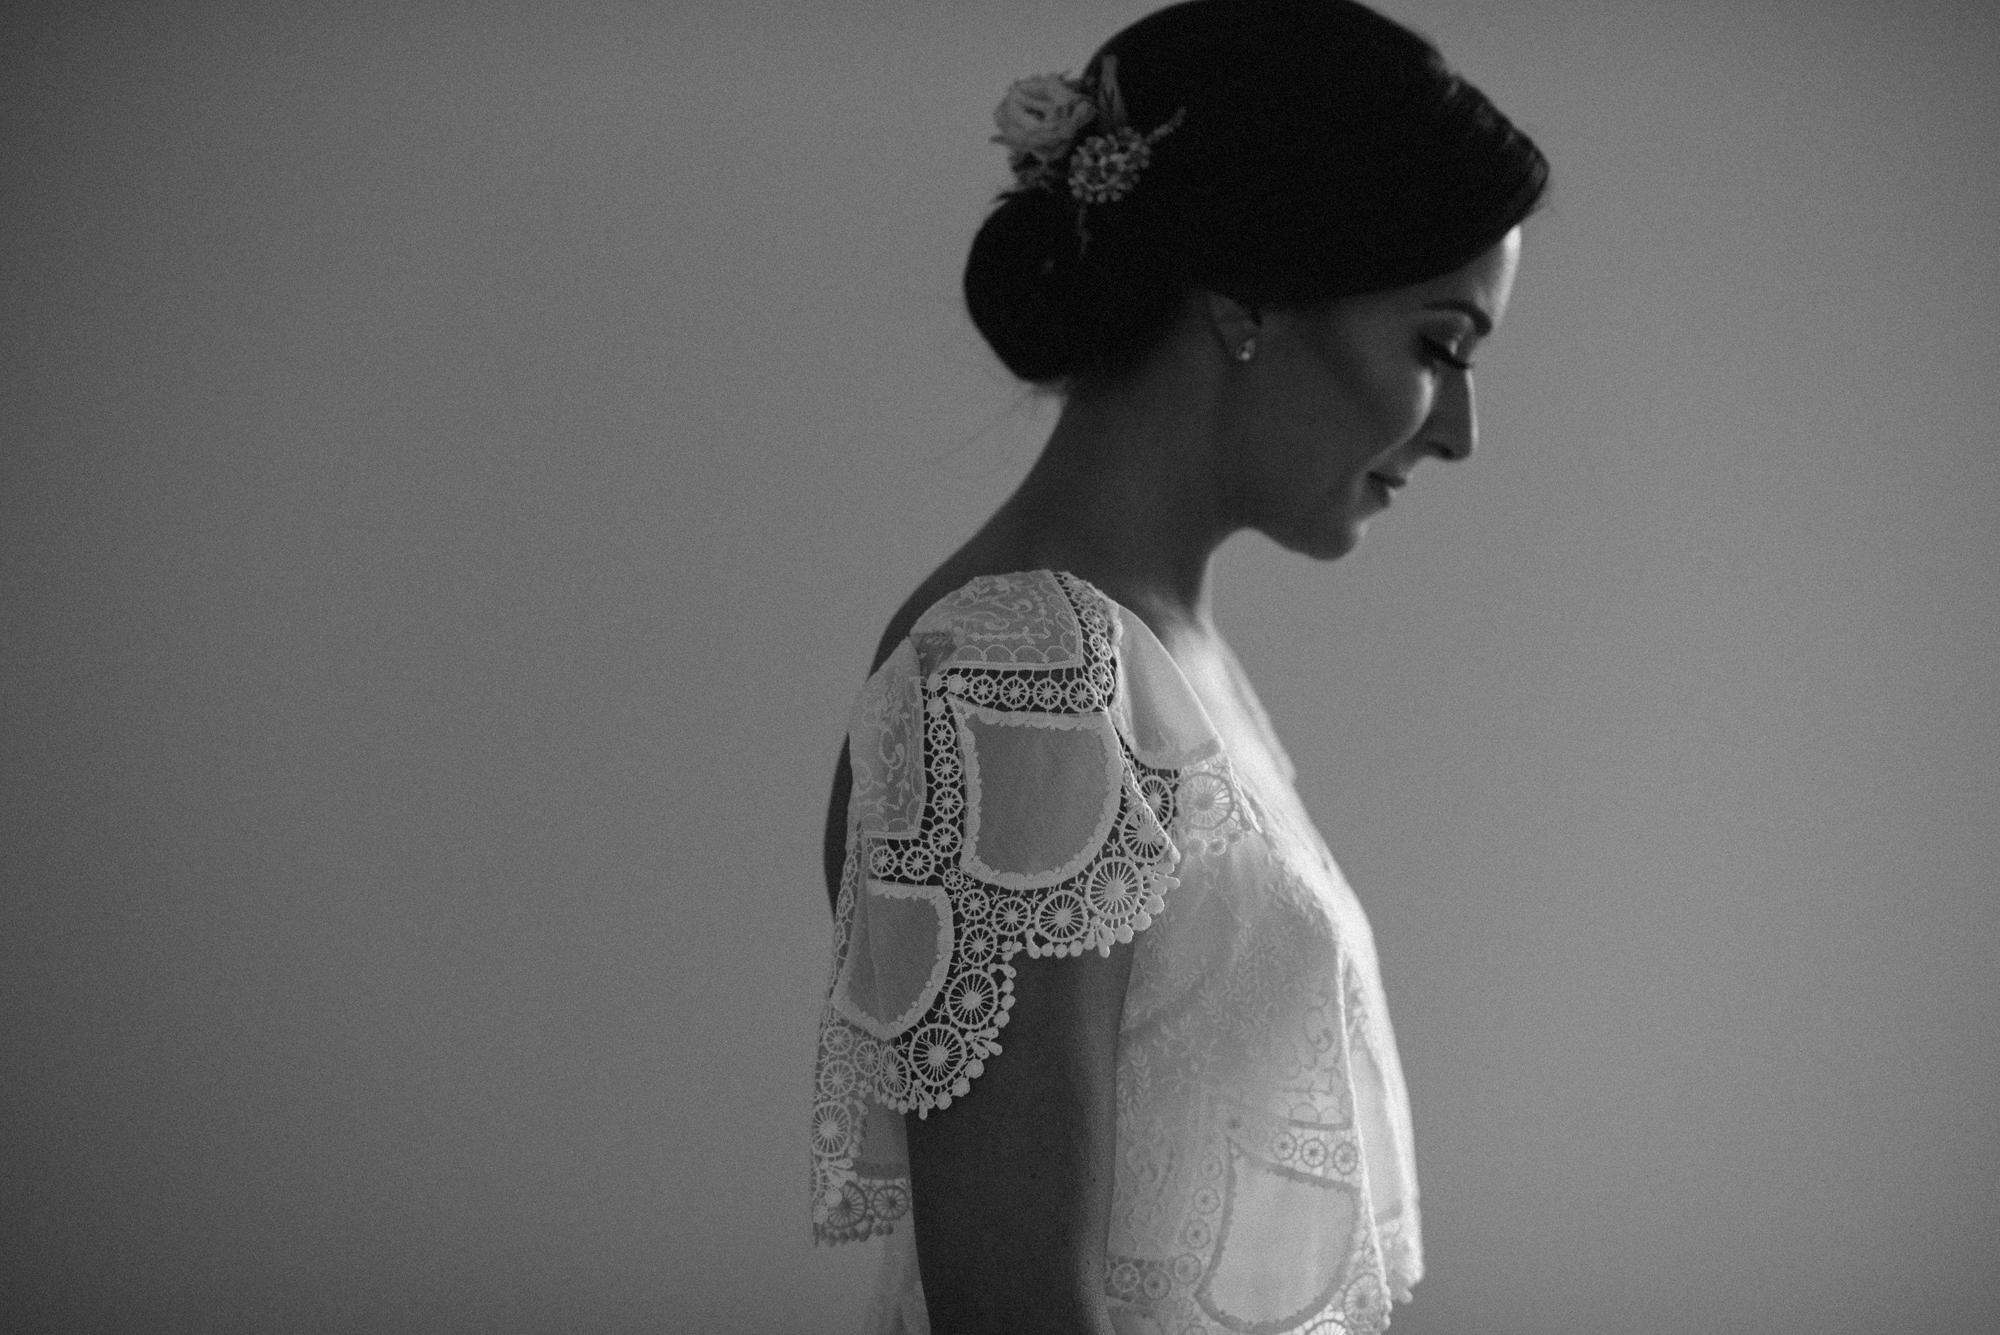 ghan_house_Wedding_Sarah_Fyffe_wedding_photographyer_4.jpg